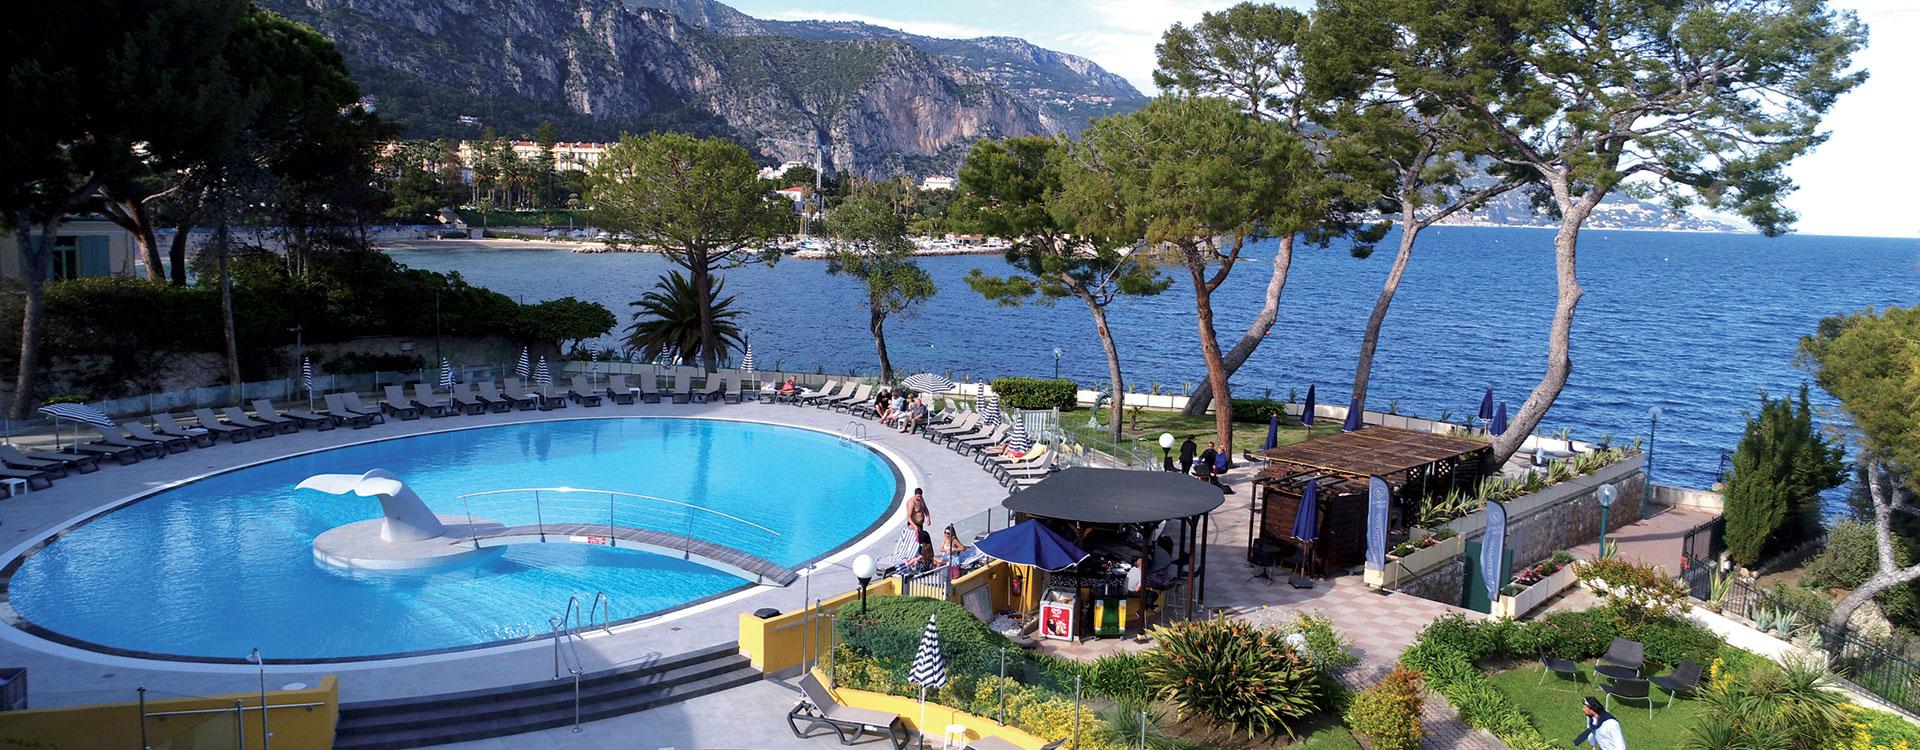 Delcloy Hotel